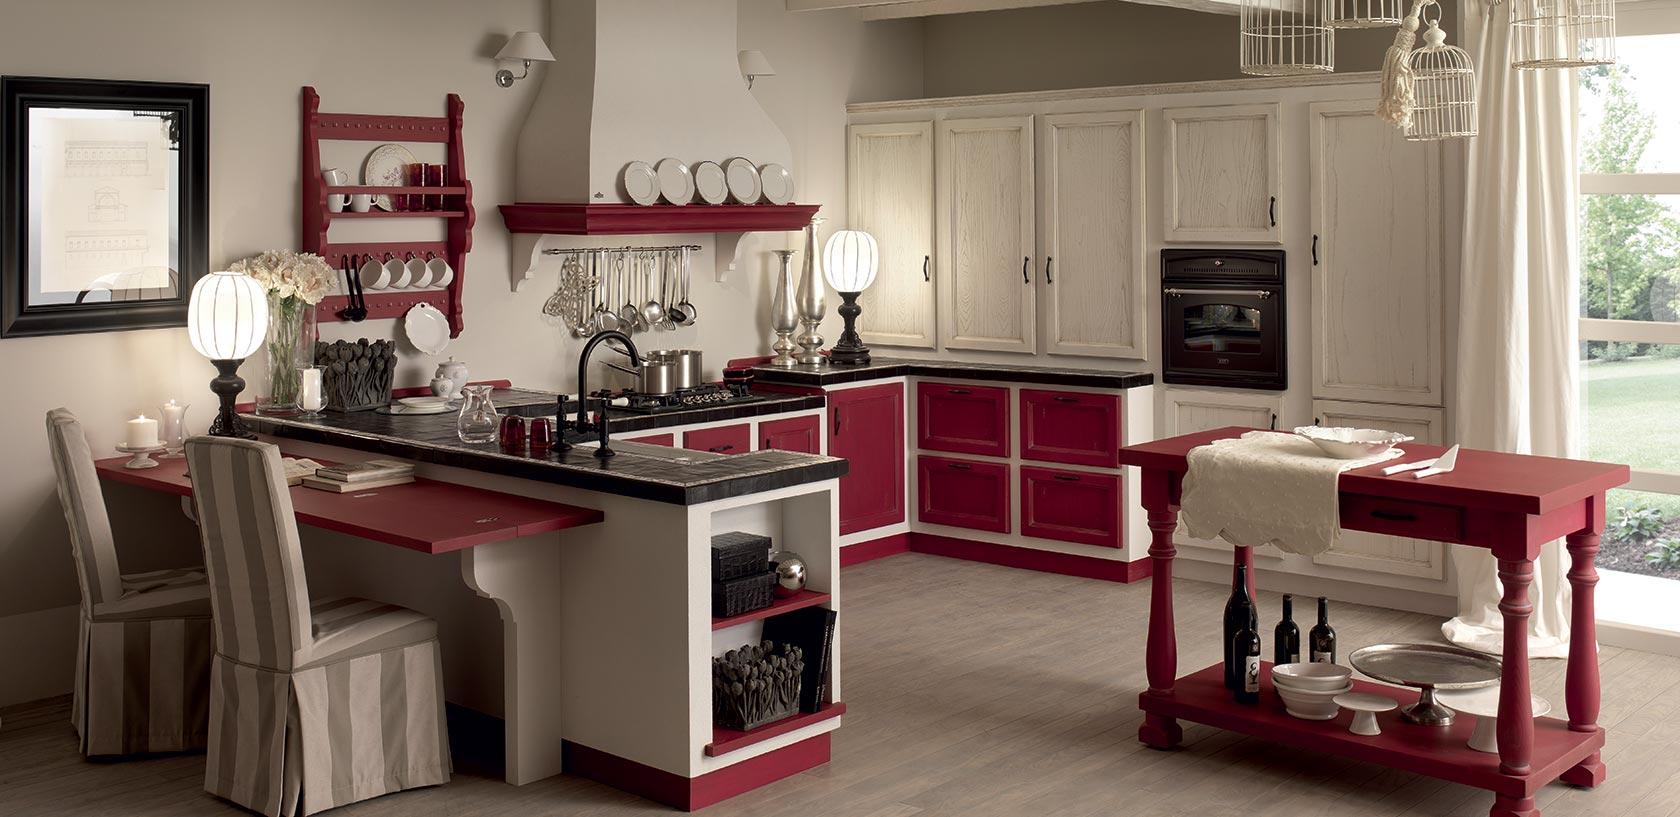 Cucina In Muratura Costo. Elegant Emejing Cucina In Muratura Costo ...